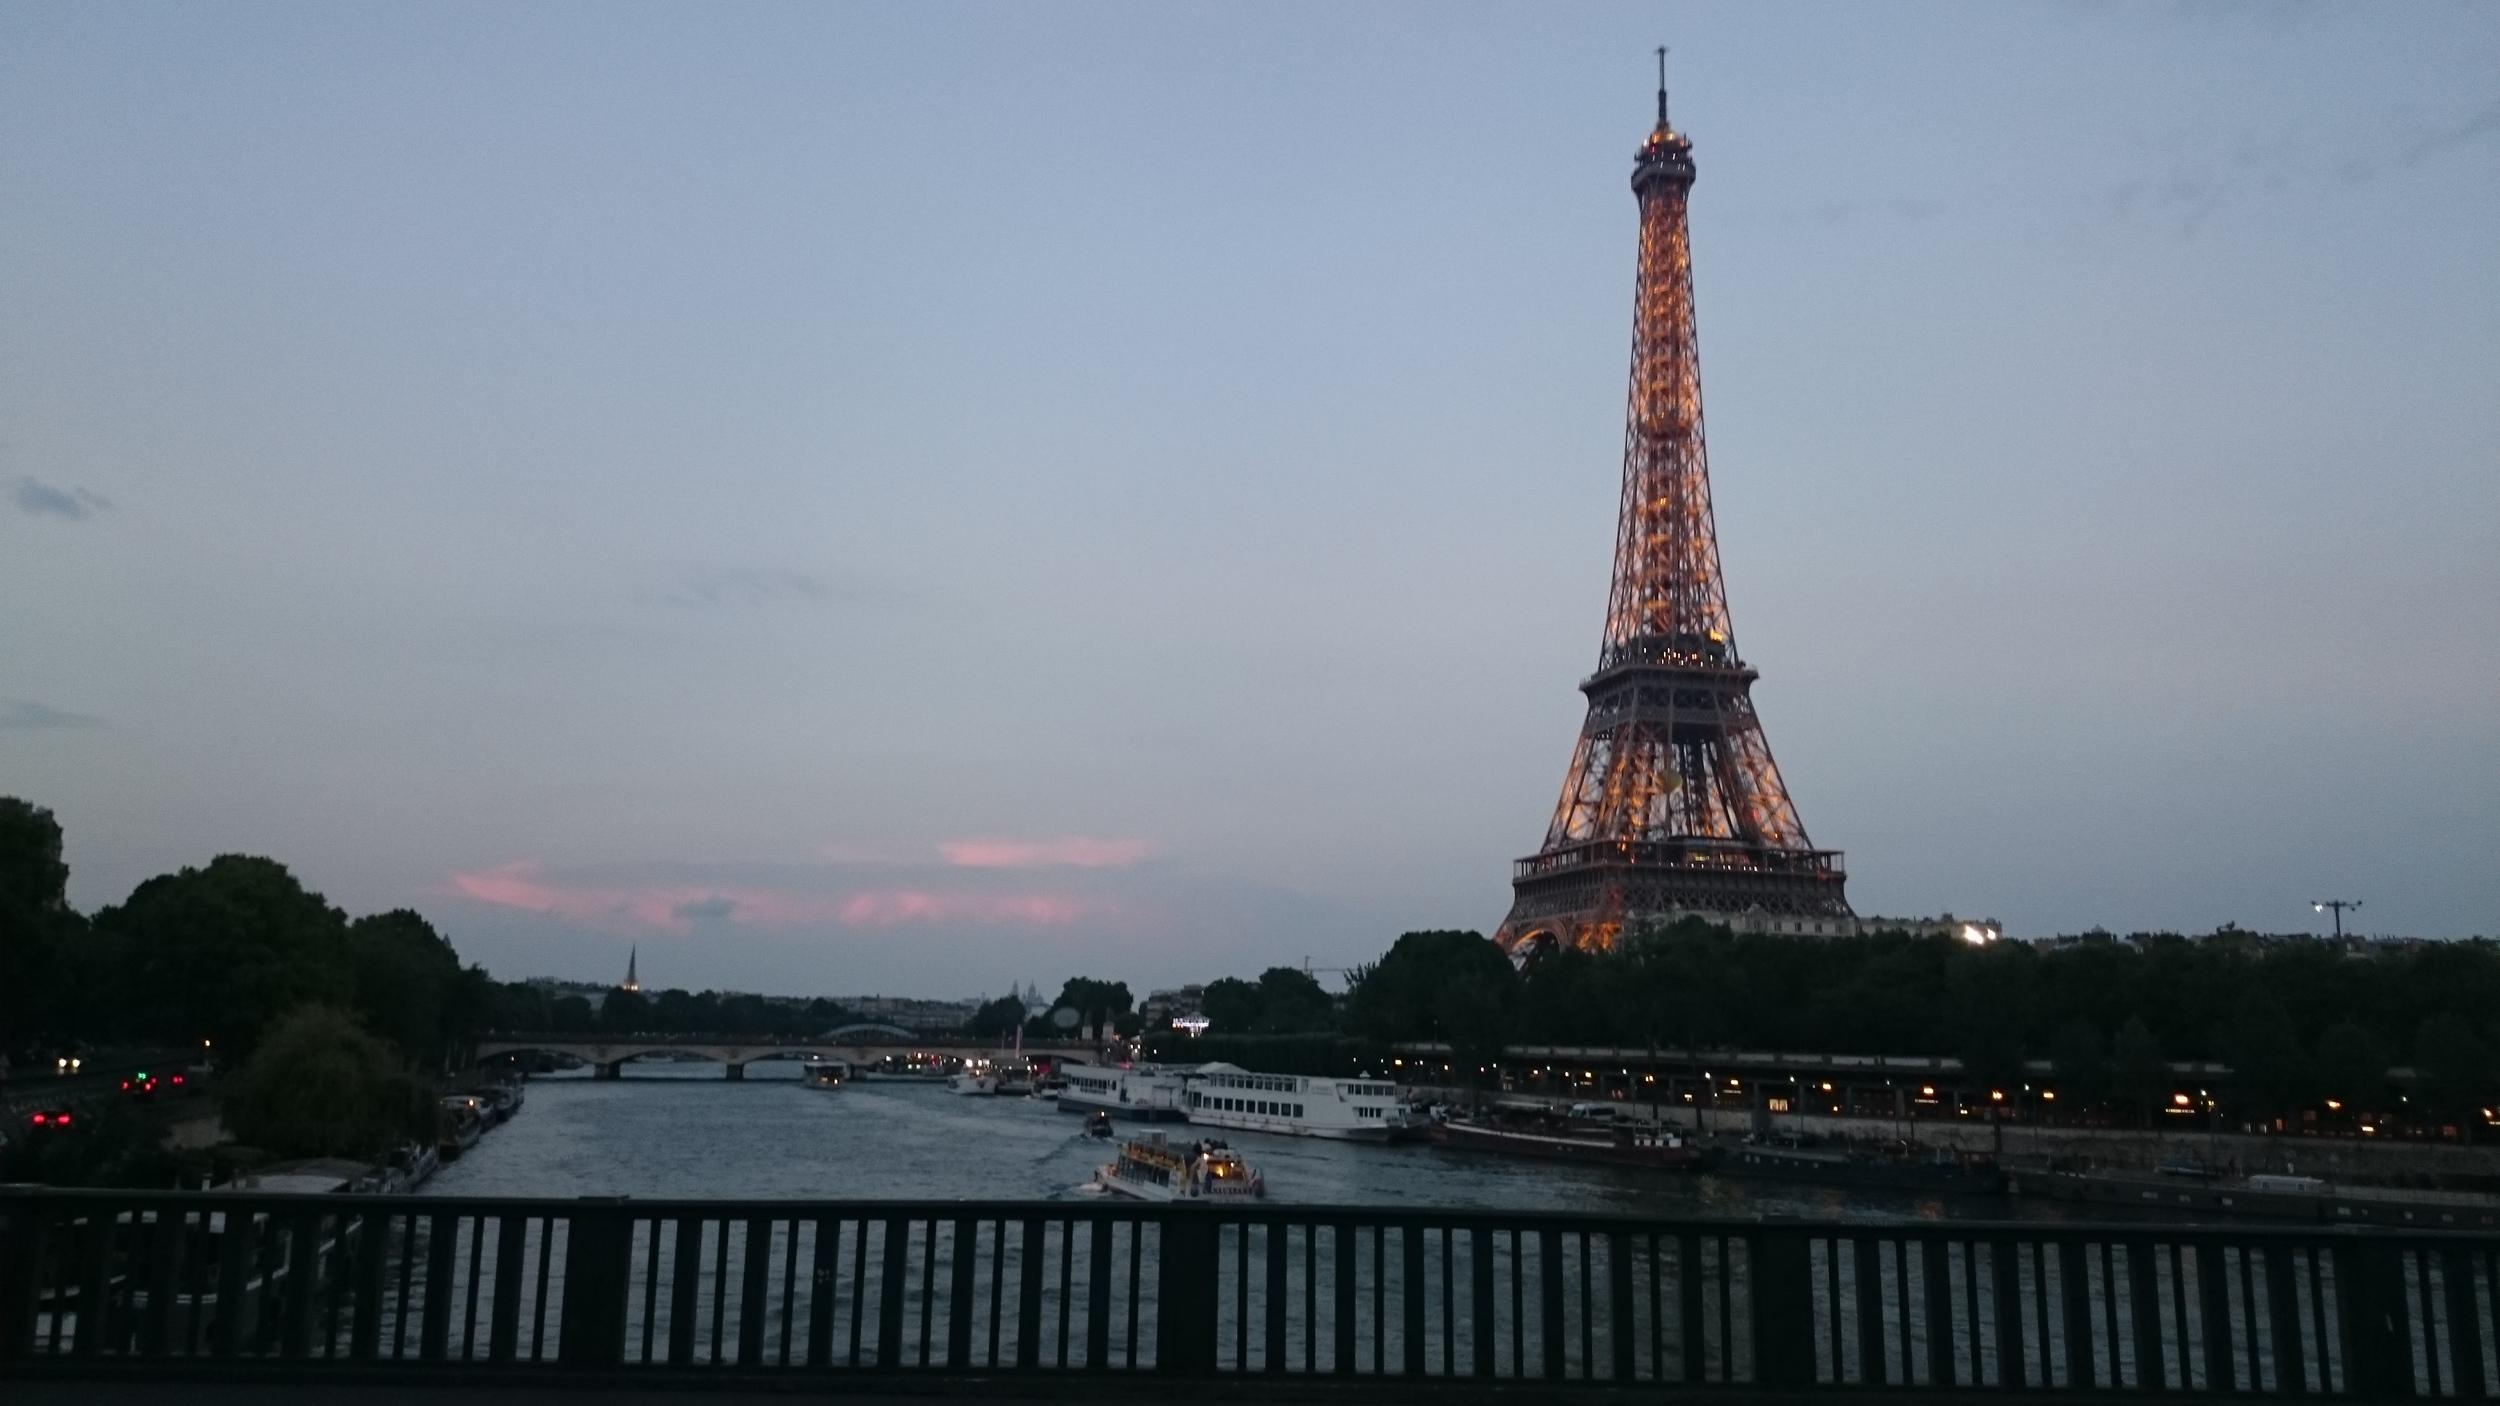 Shiny Eiffel Tower